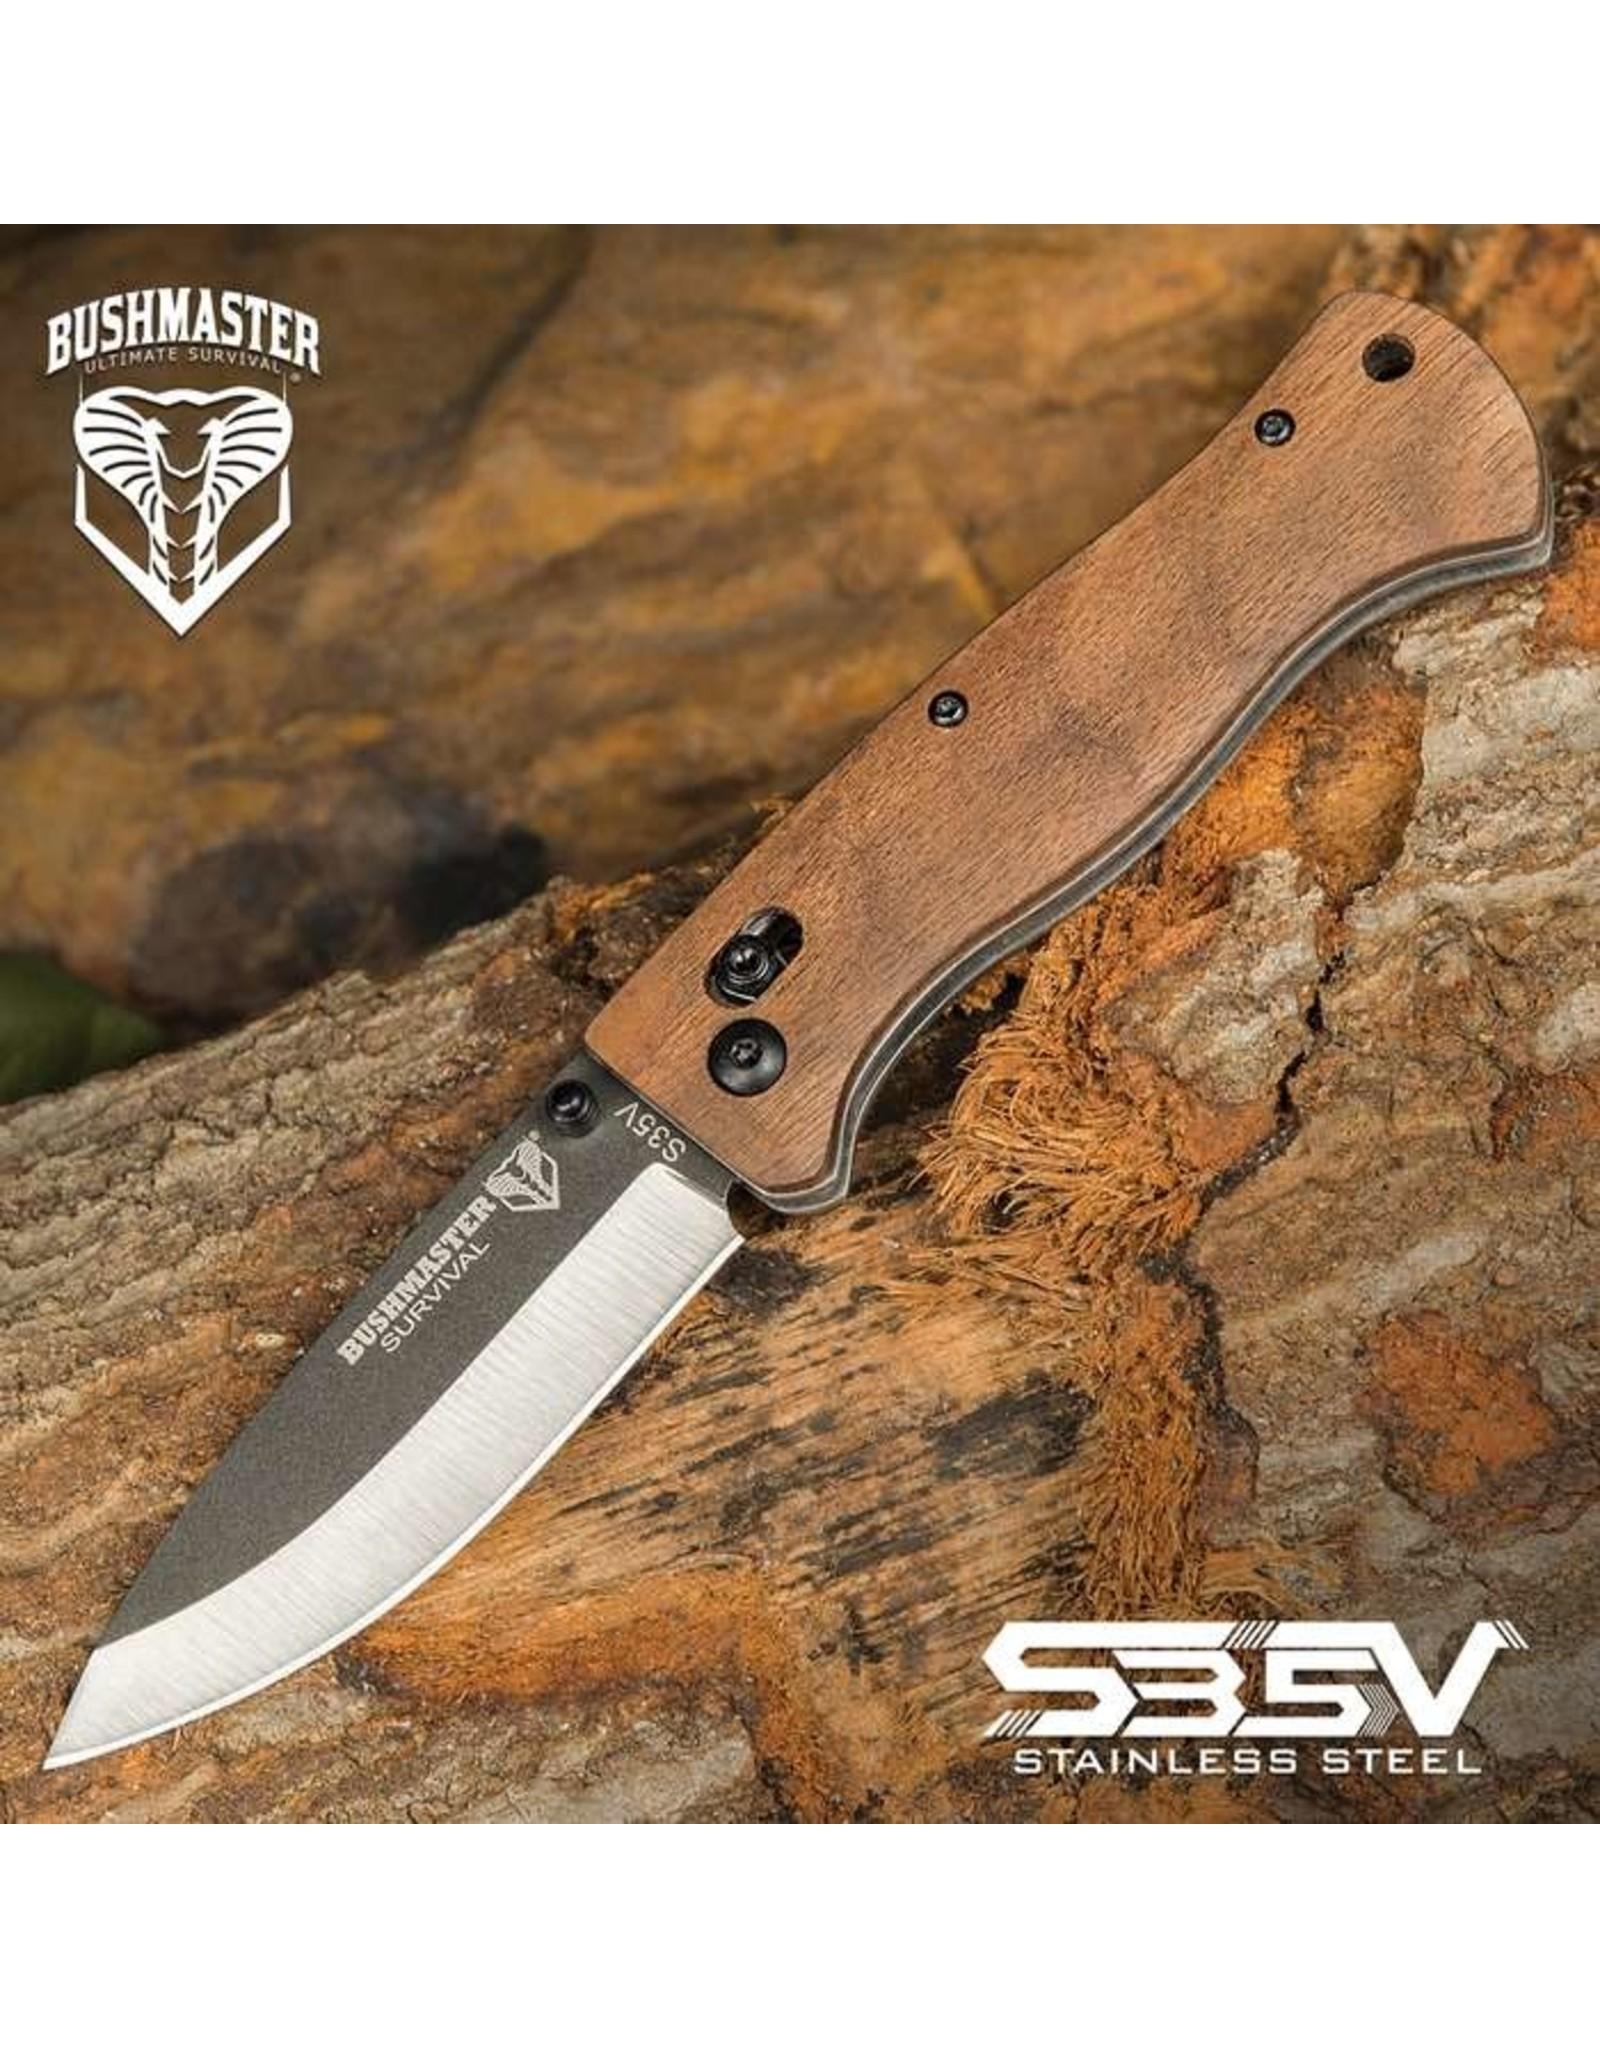 Bushmaster Explorer Pocket Knife